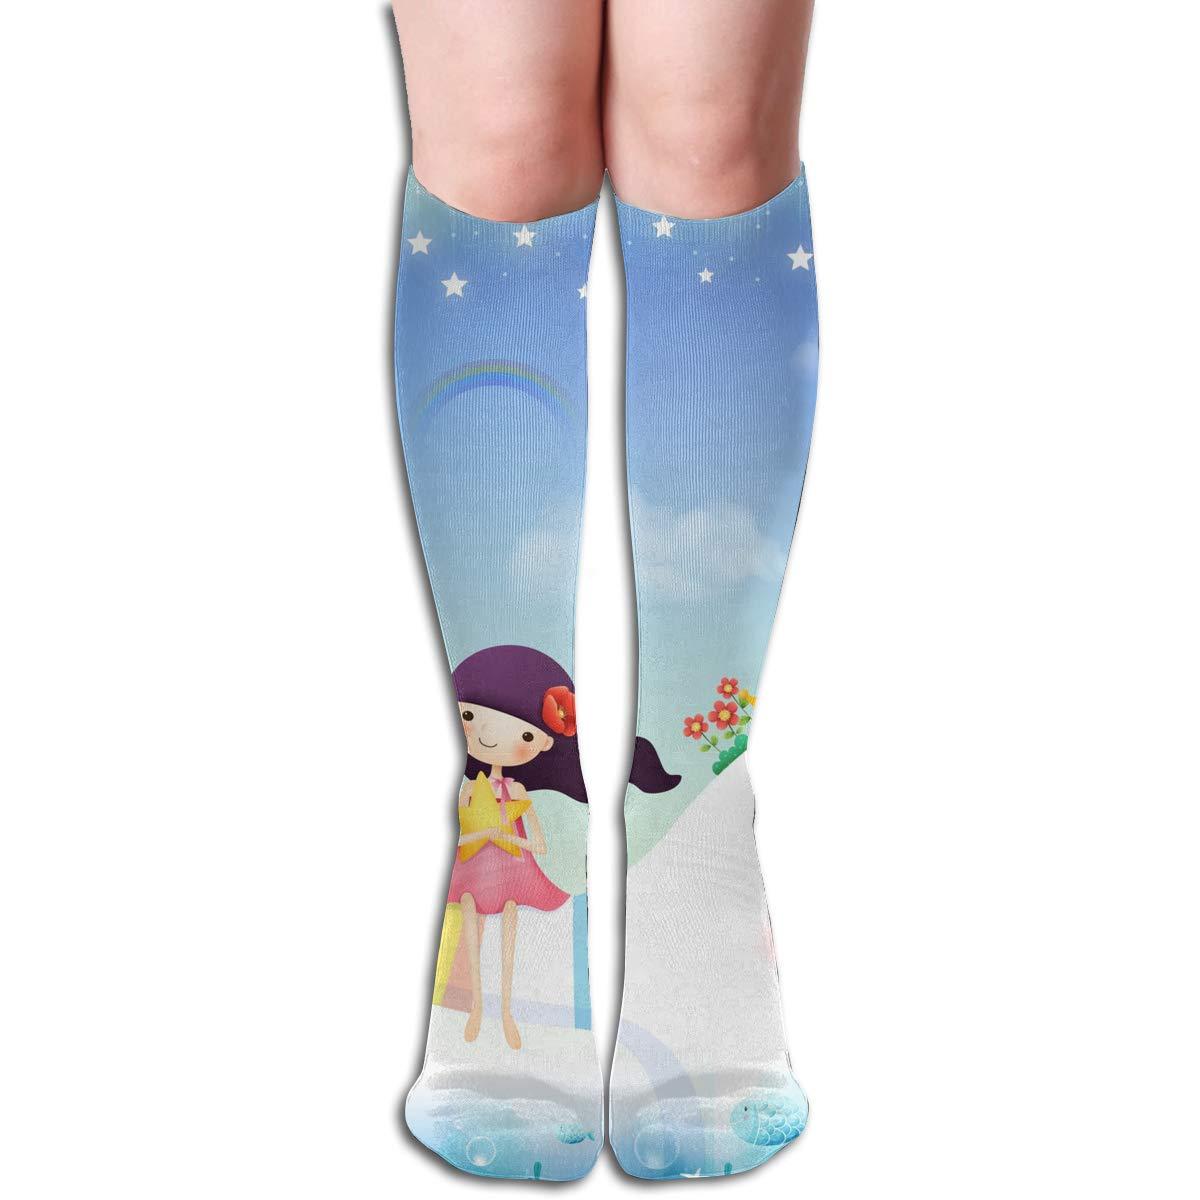 Women Socks Over Knee Girls Going To School On Elephant Winter Customized For Halloween